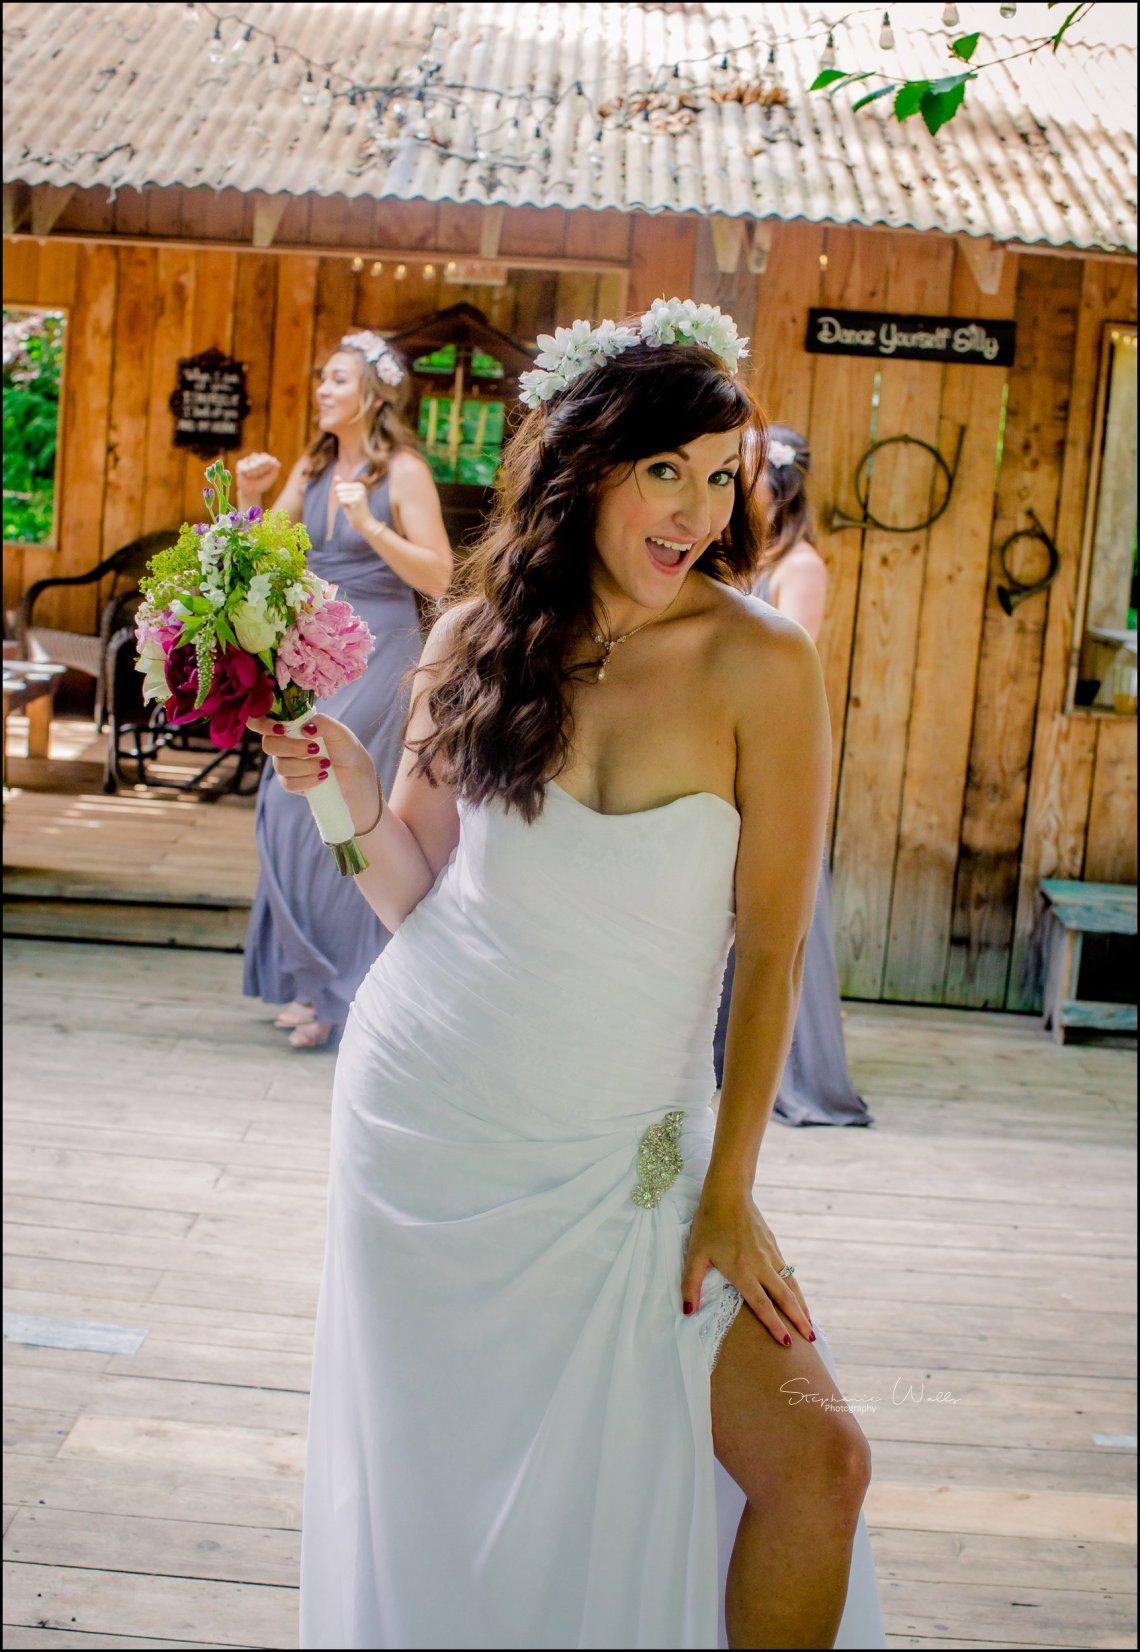 Gauthier035 Catherane & Tylers Diyed Maroni Meadows Wedding   Snohomish, Wa